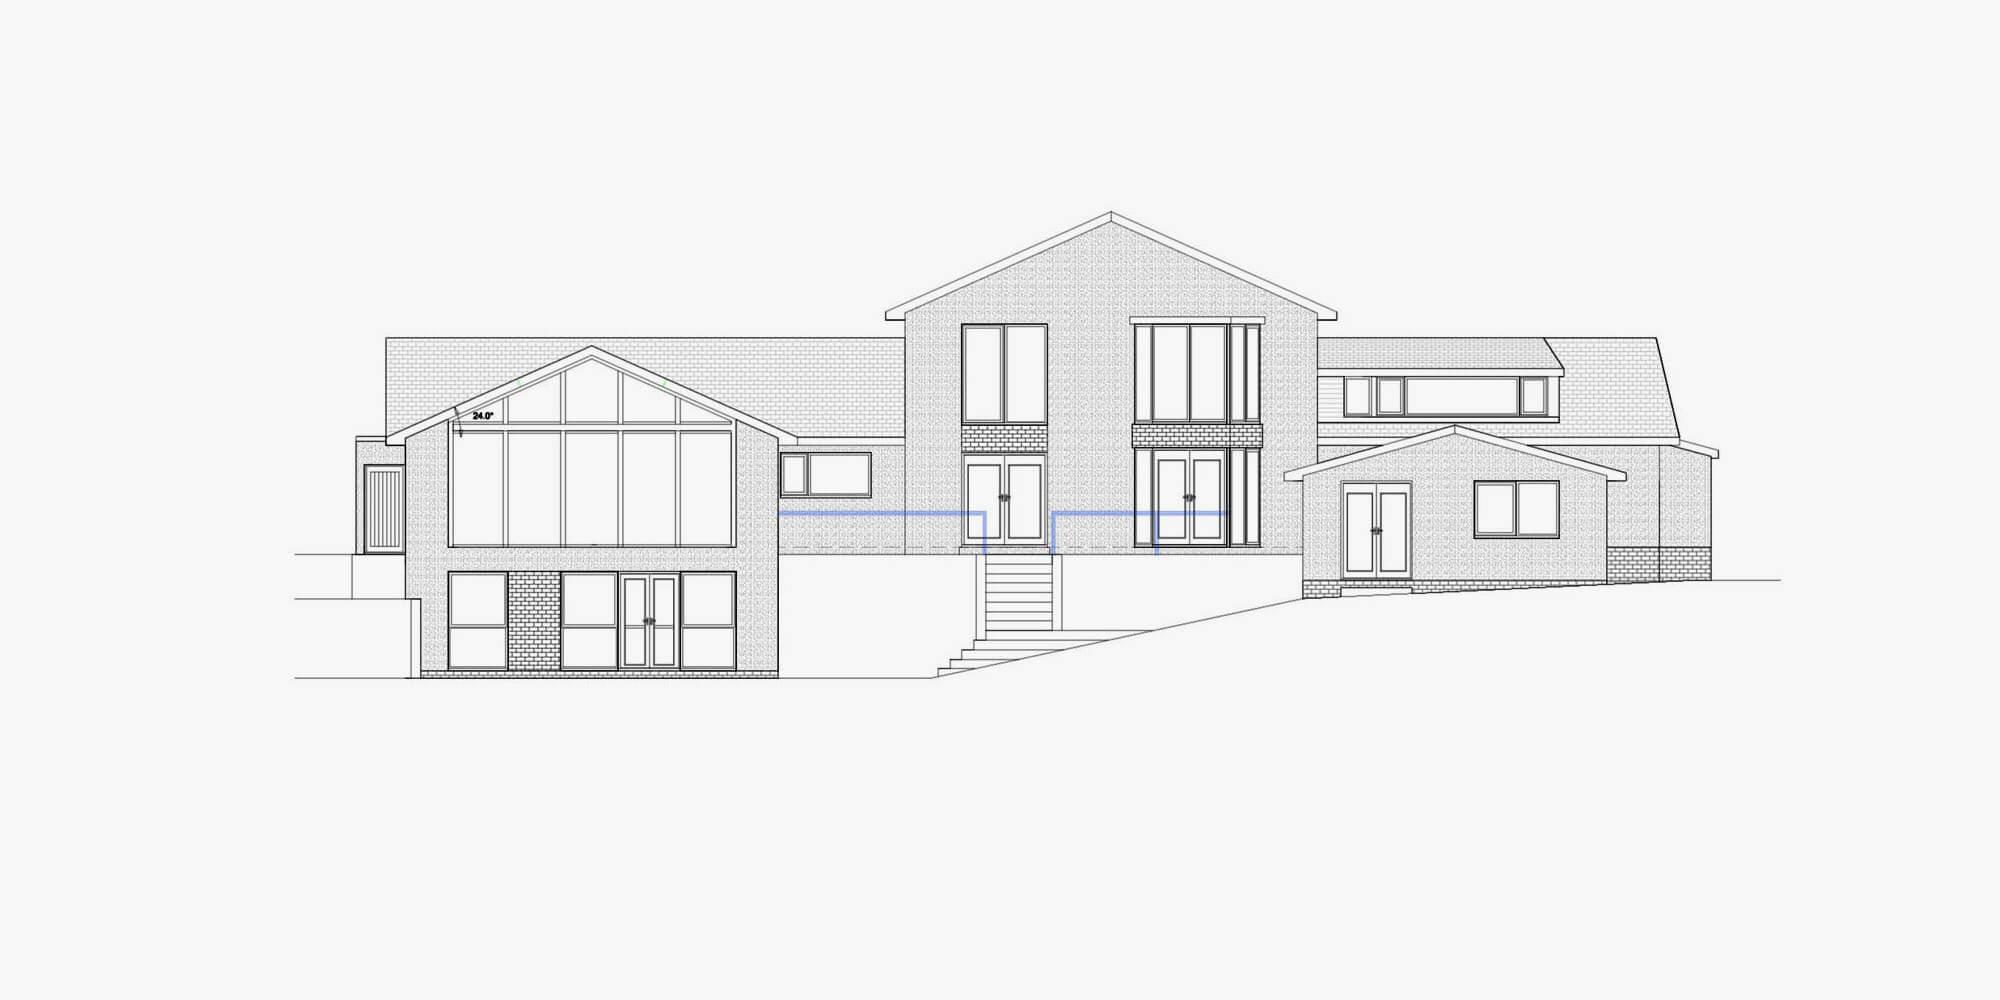 Ashfurlong House extension